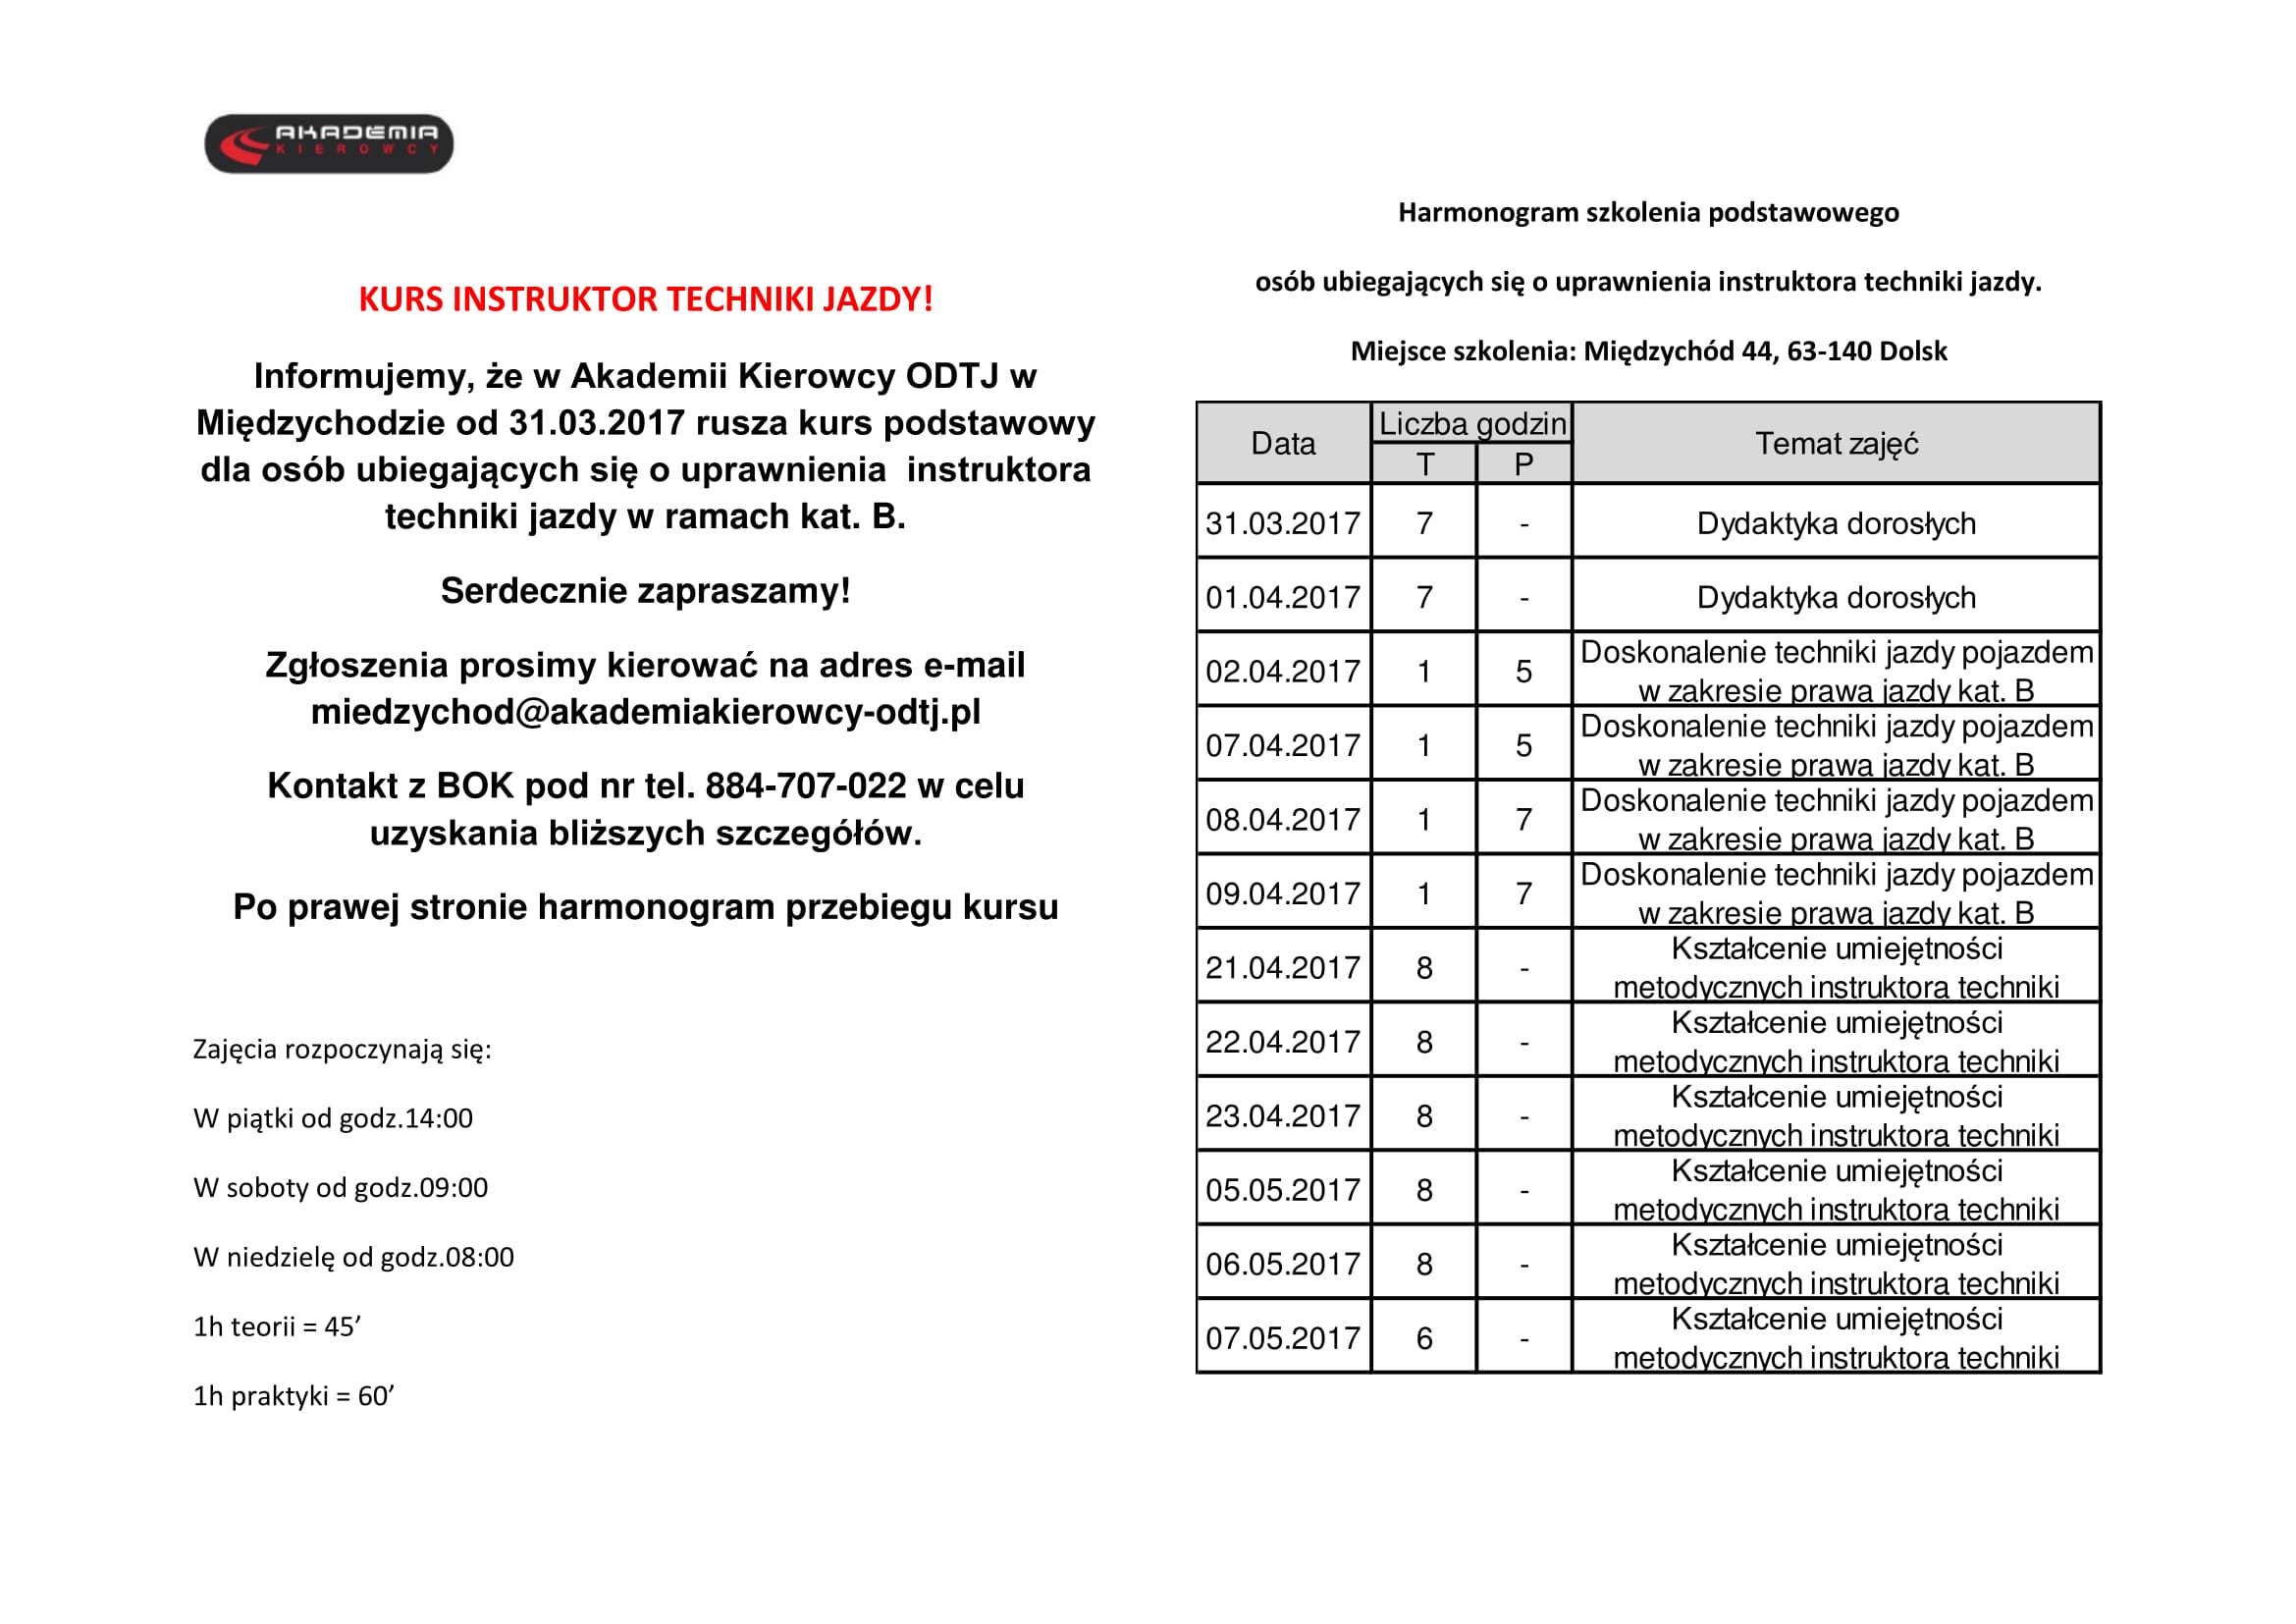 KURS INSTRUKTOR TECHNIKI JAZDY-1